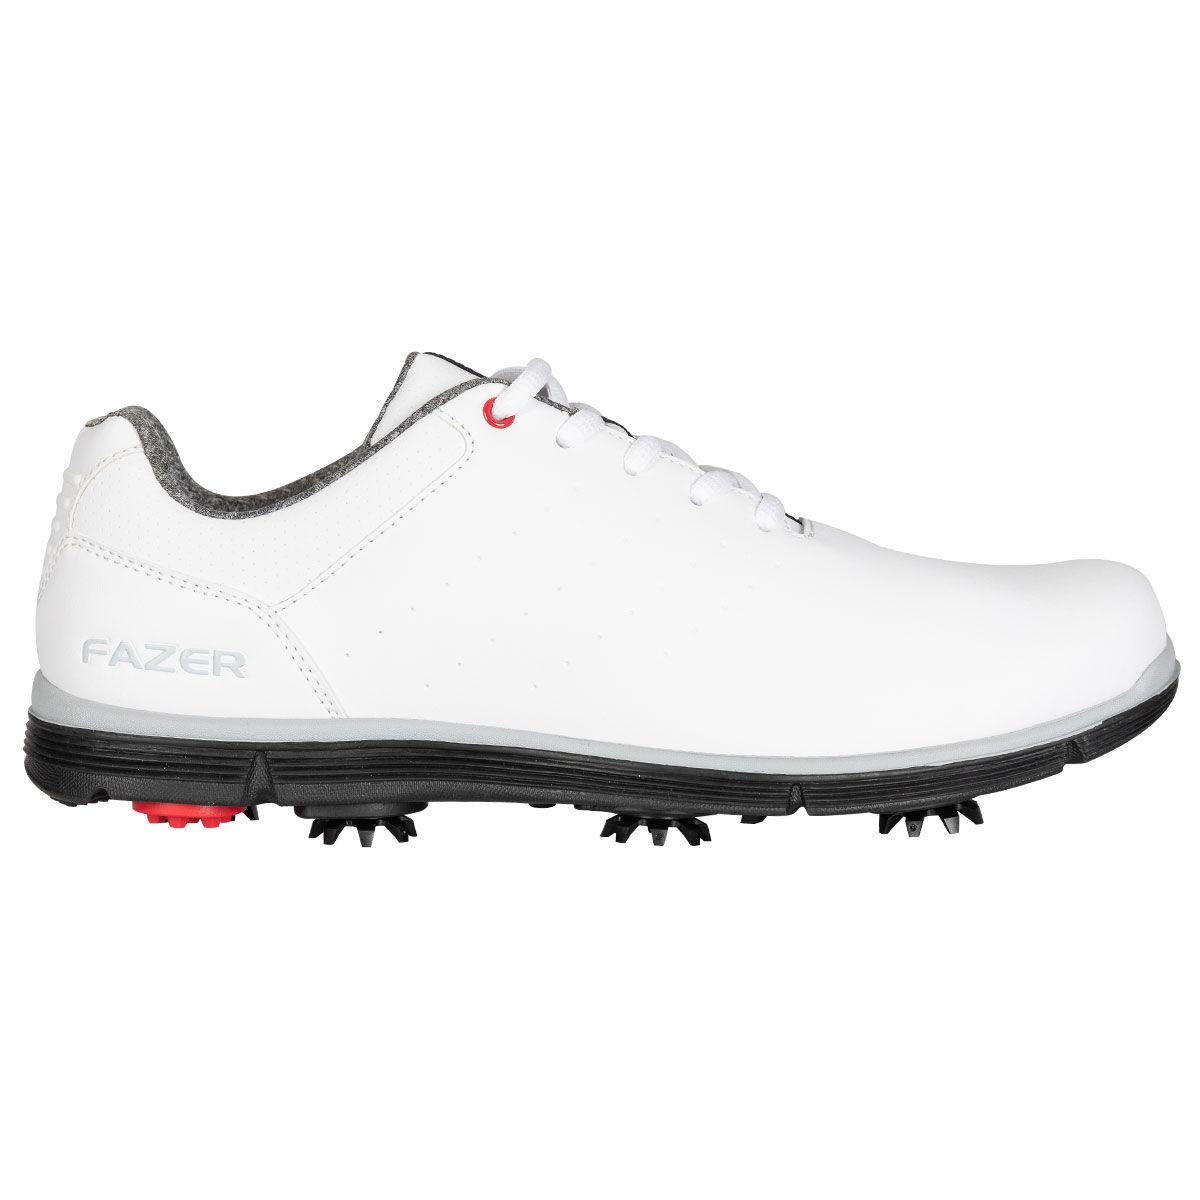 Fazer FZ-01 Strike Golf Shoes, Male, White, 8, Regular